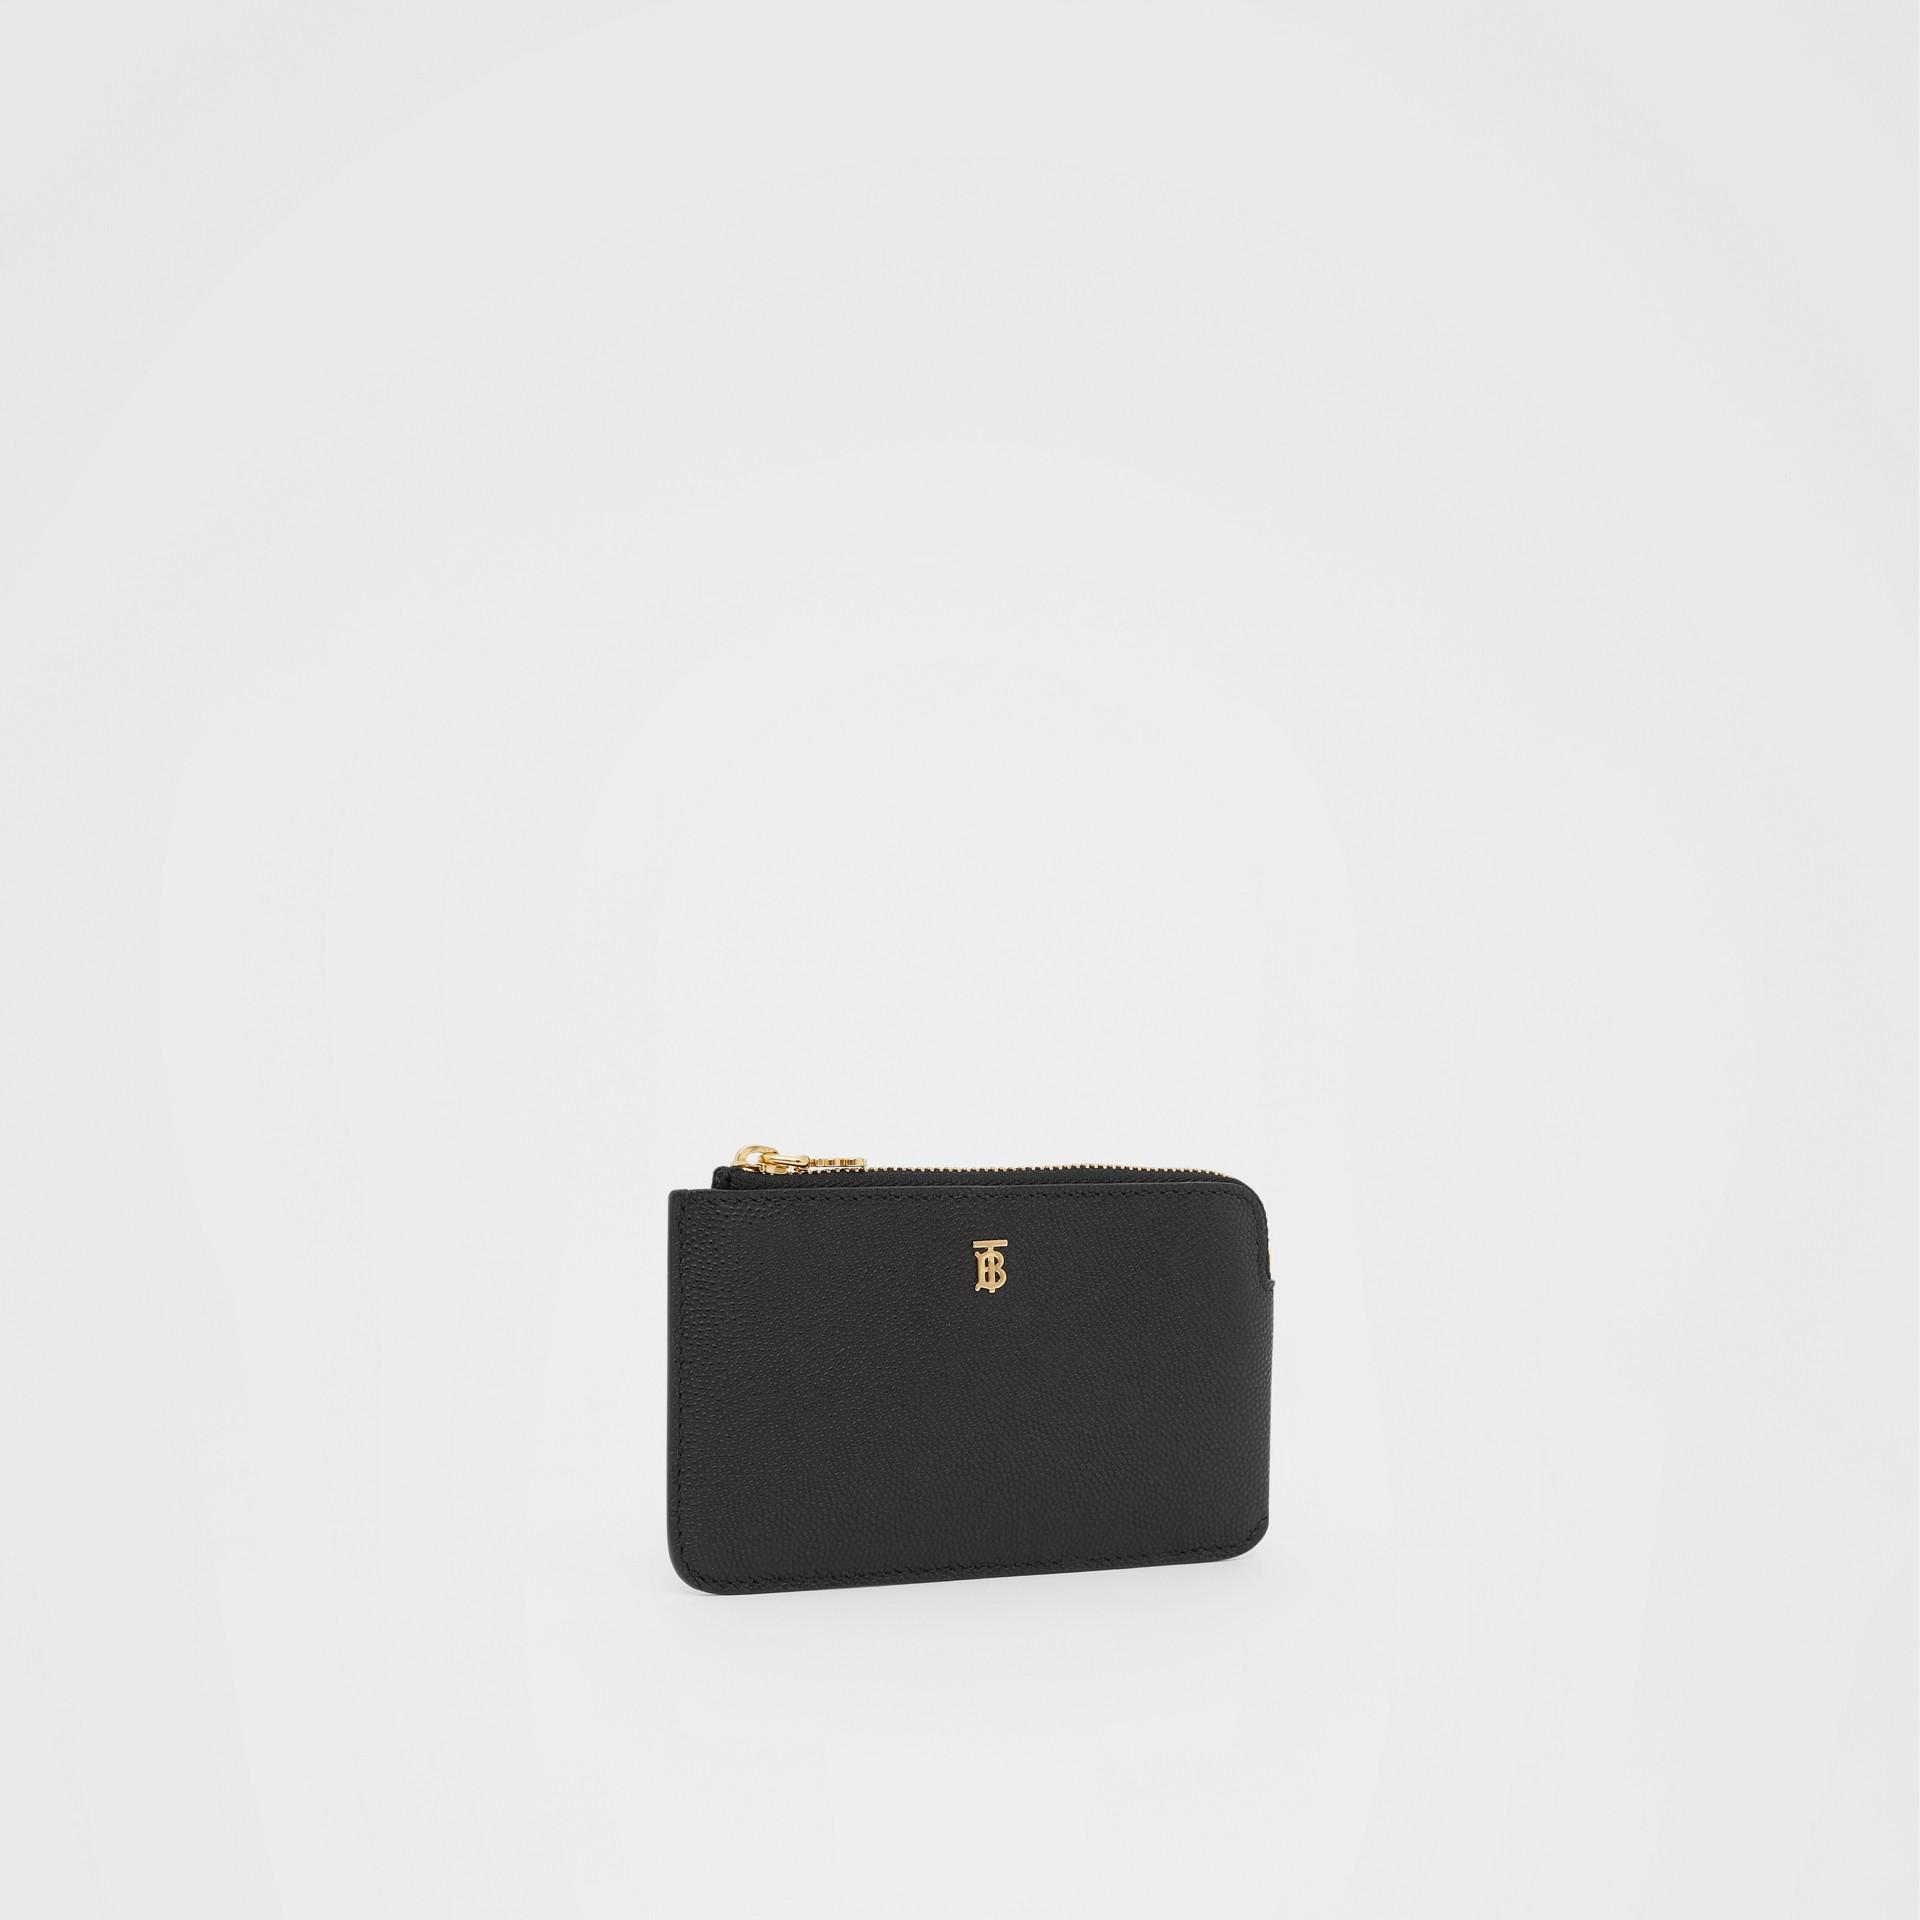 Monogram Motif Grainy Leather Zip Coin Case in Black - Women | Burberry - gallery image 3